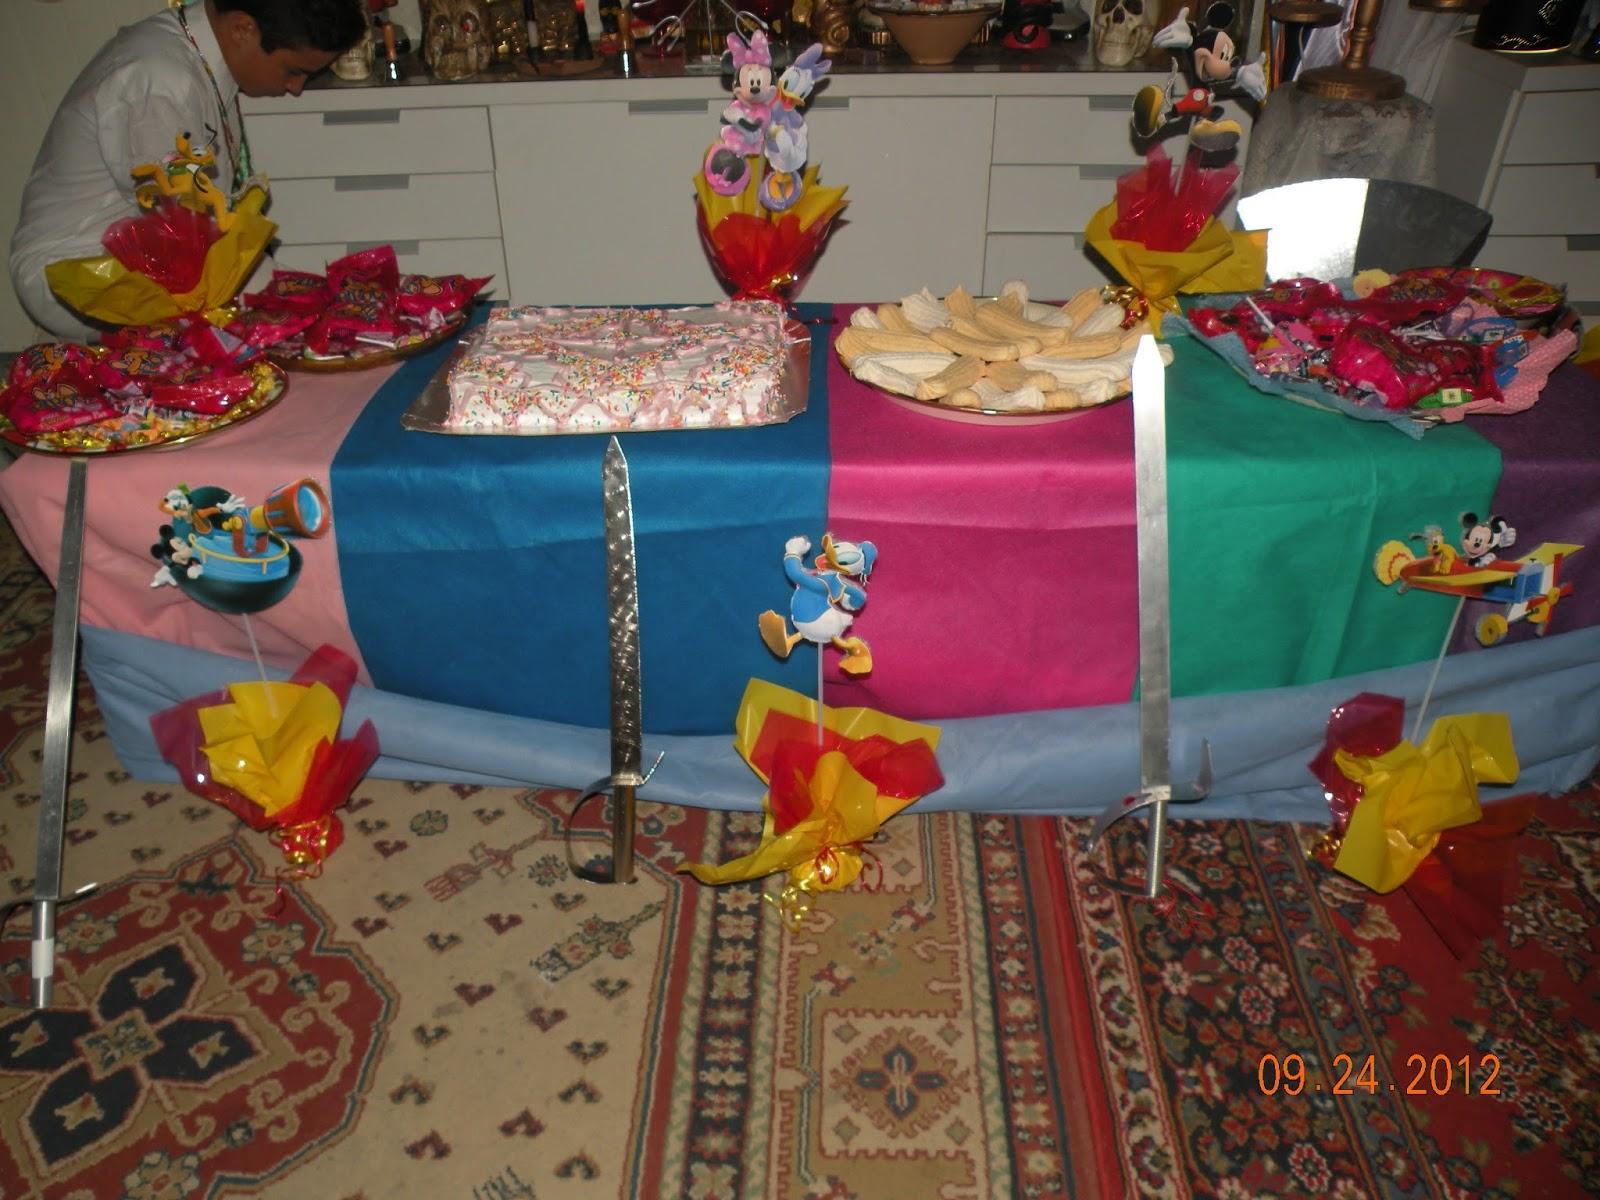 decoracao festa xango:Festa de Cosme Damião (setembro de 2012)